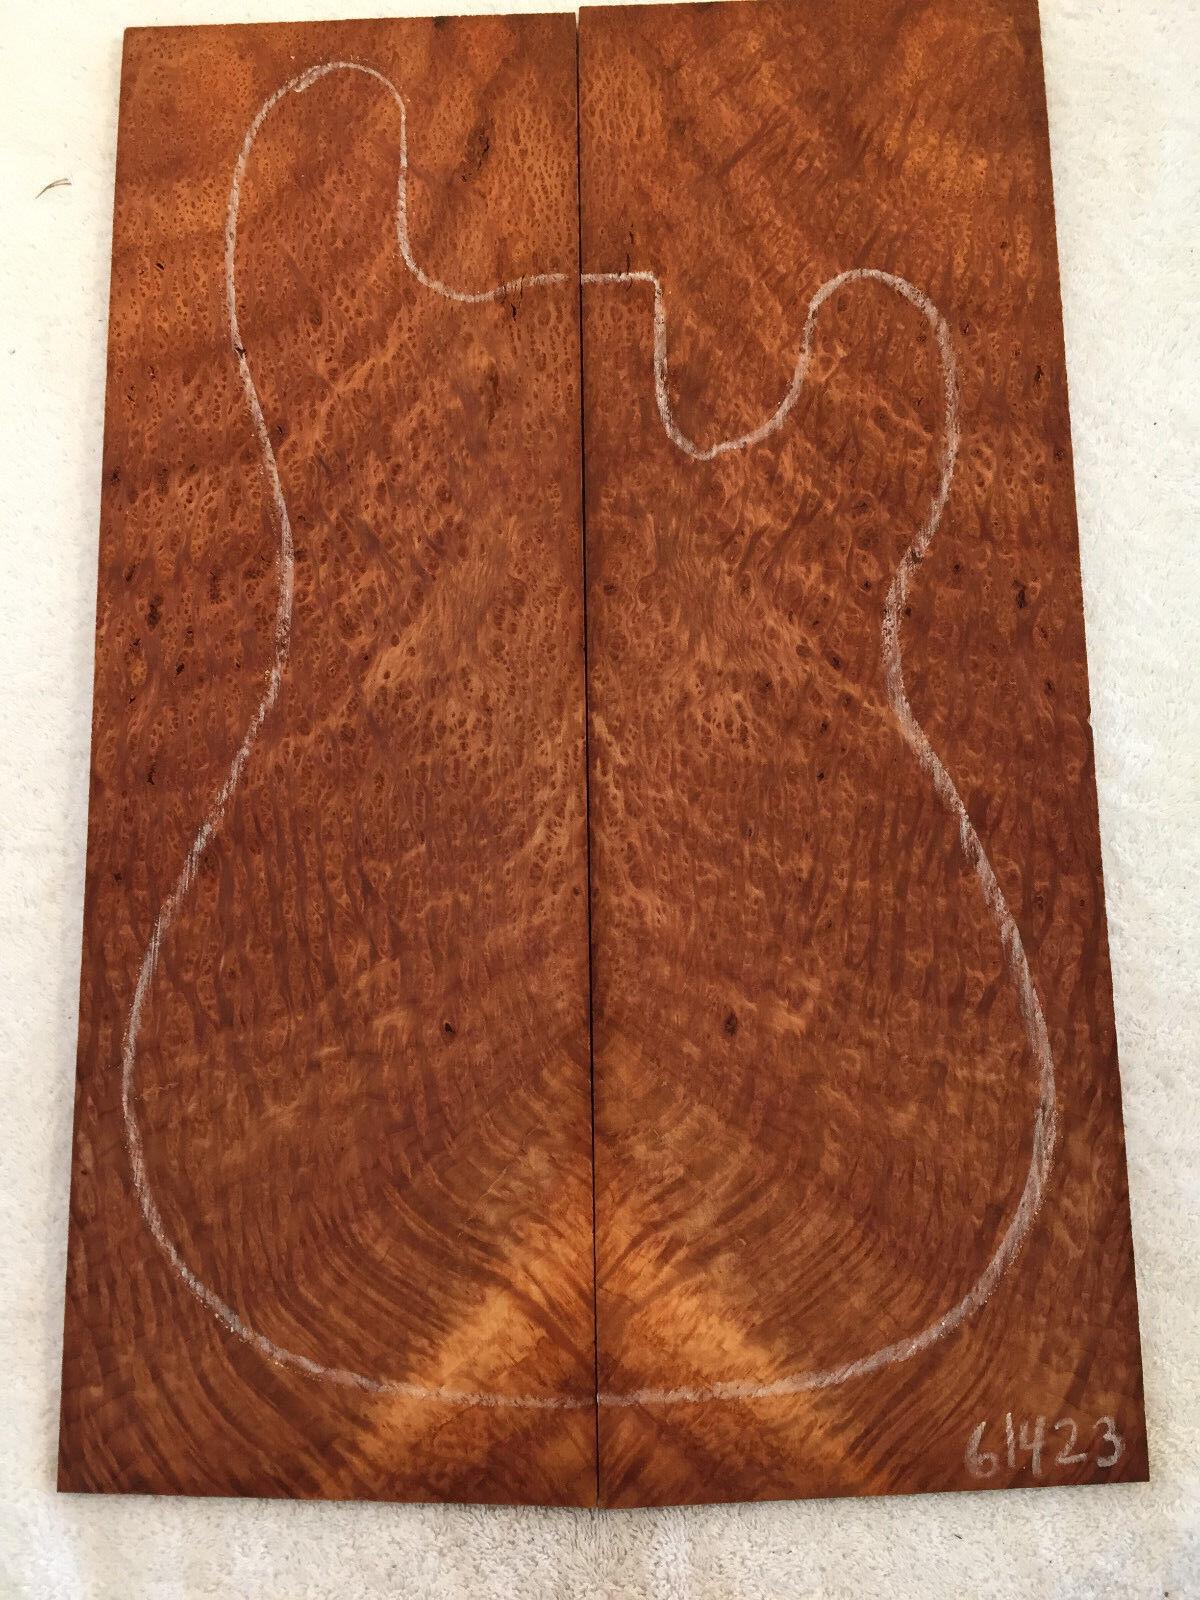 Rotwood Lace Burl Bookmatch Set - Luthier Tone Wood .34 x 15 x 22.5 - 71423